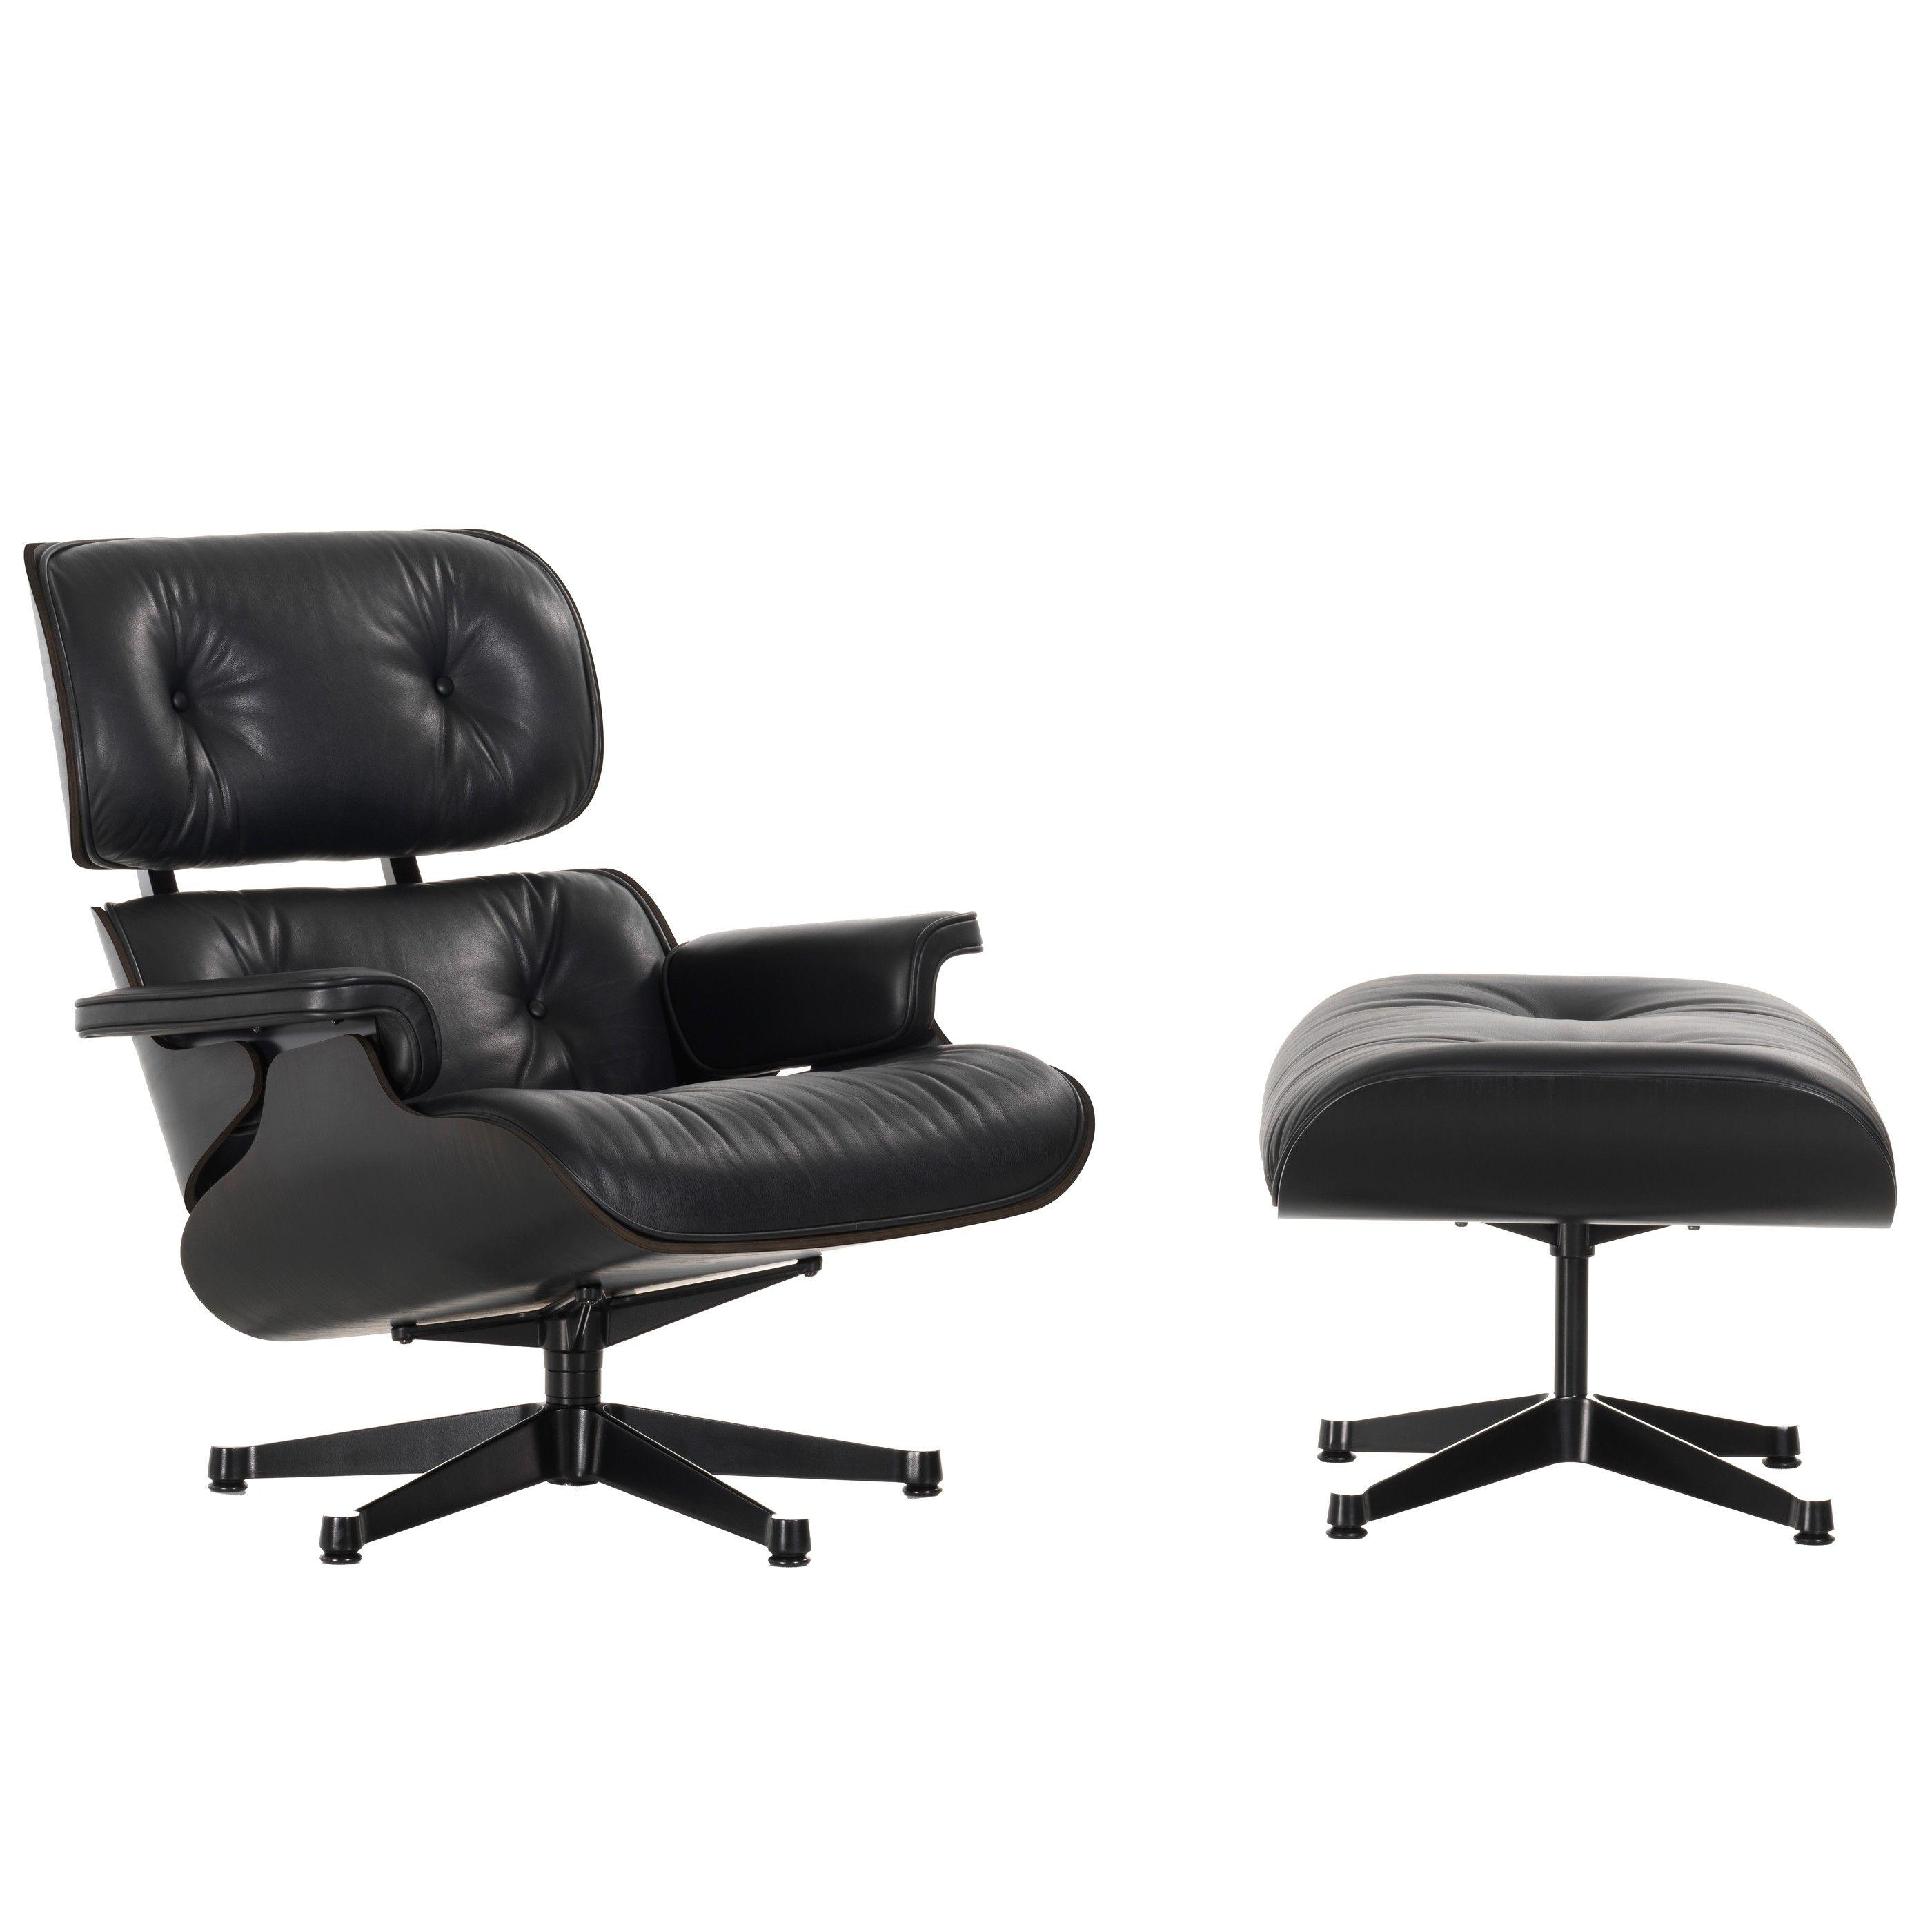 Vitra eames lounge chair met ottoman fauteuil (nieuwe afmetingen ...